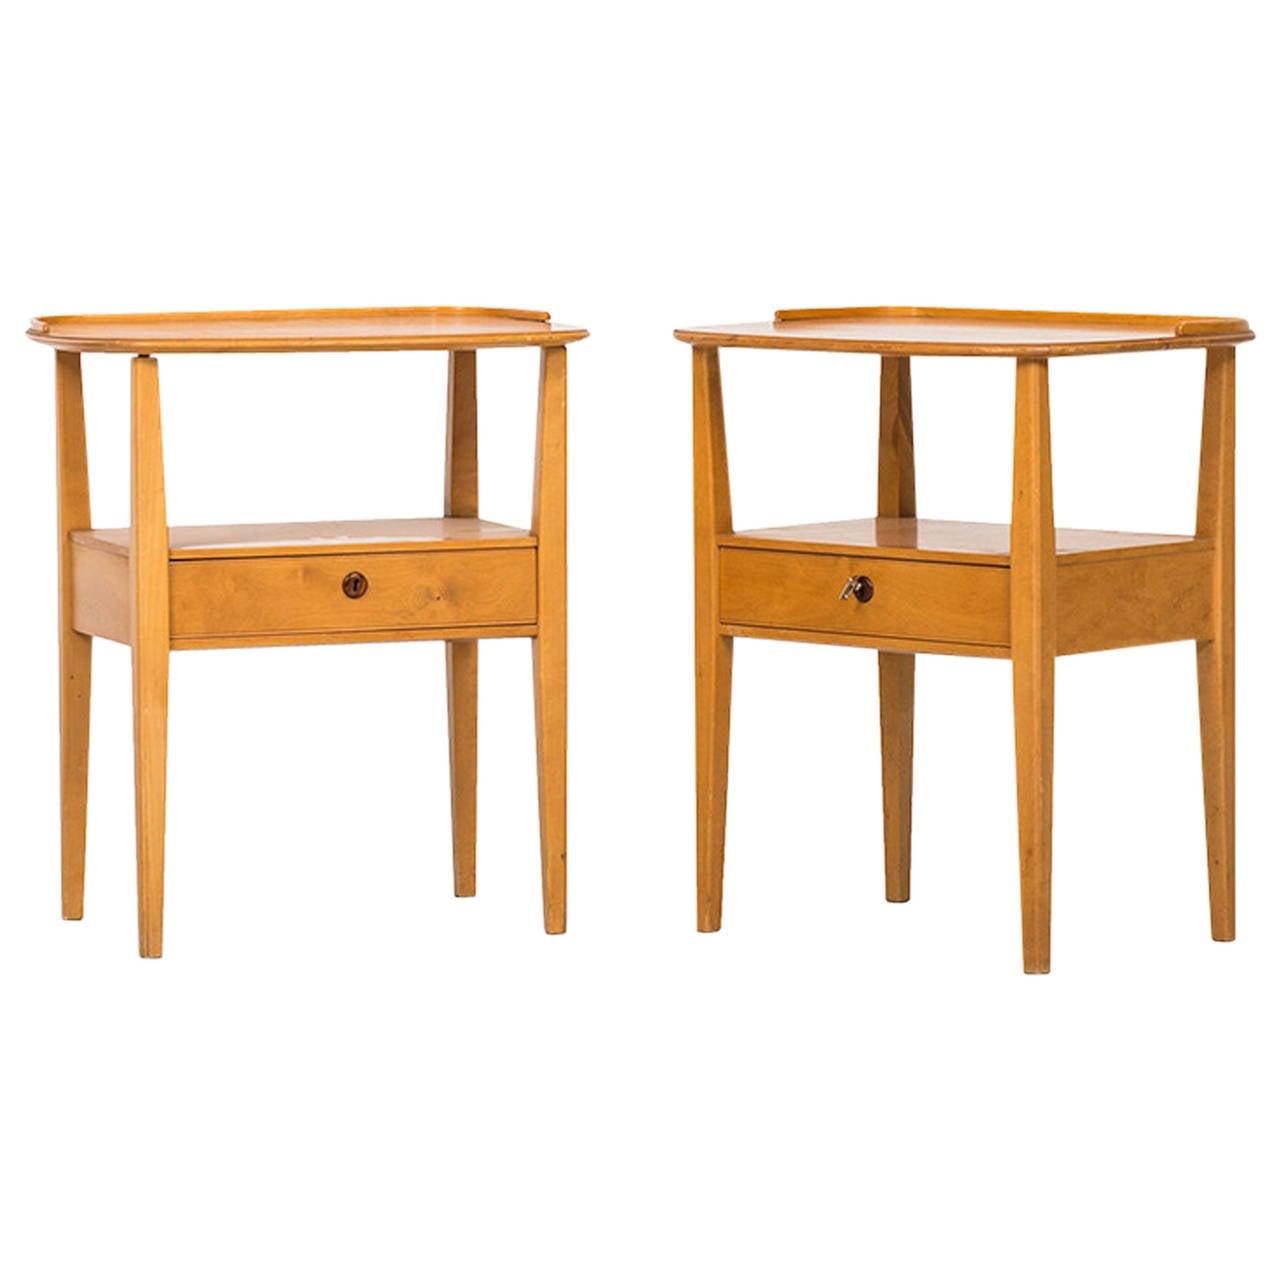 Pair of Freestanding Bedside Tables by Nordiska Kompaniet in Sweden